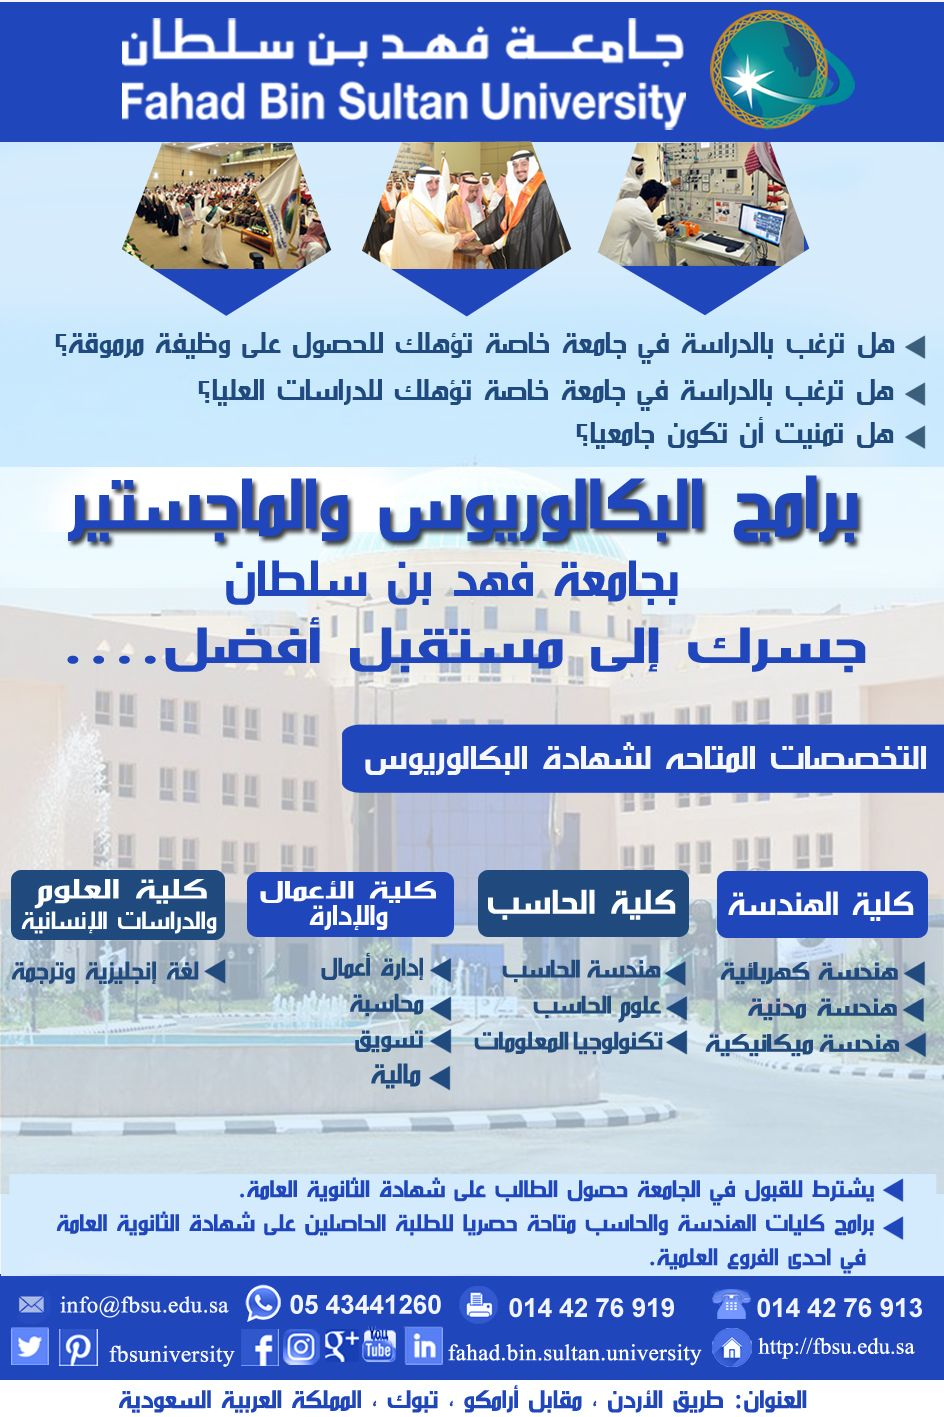 Pin By Fahad Bin Sultan University جا On جامعة فهد بن سلطان تخصصات University Private University Sultan